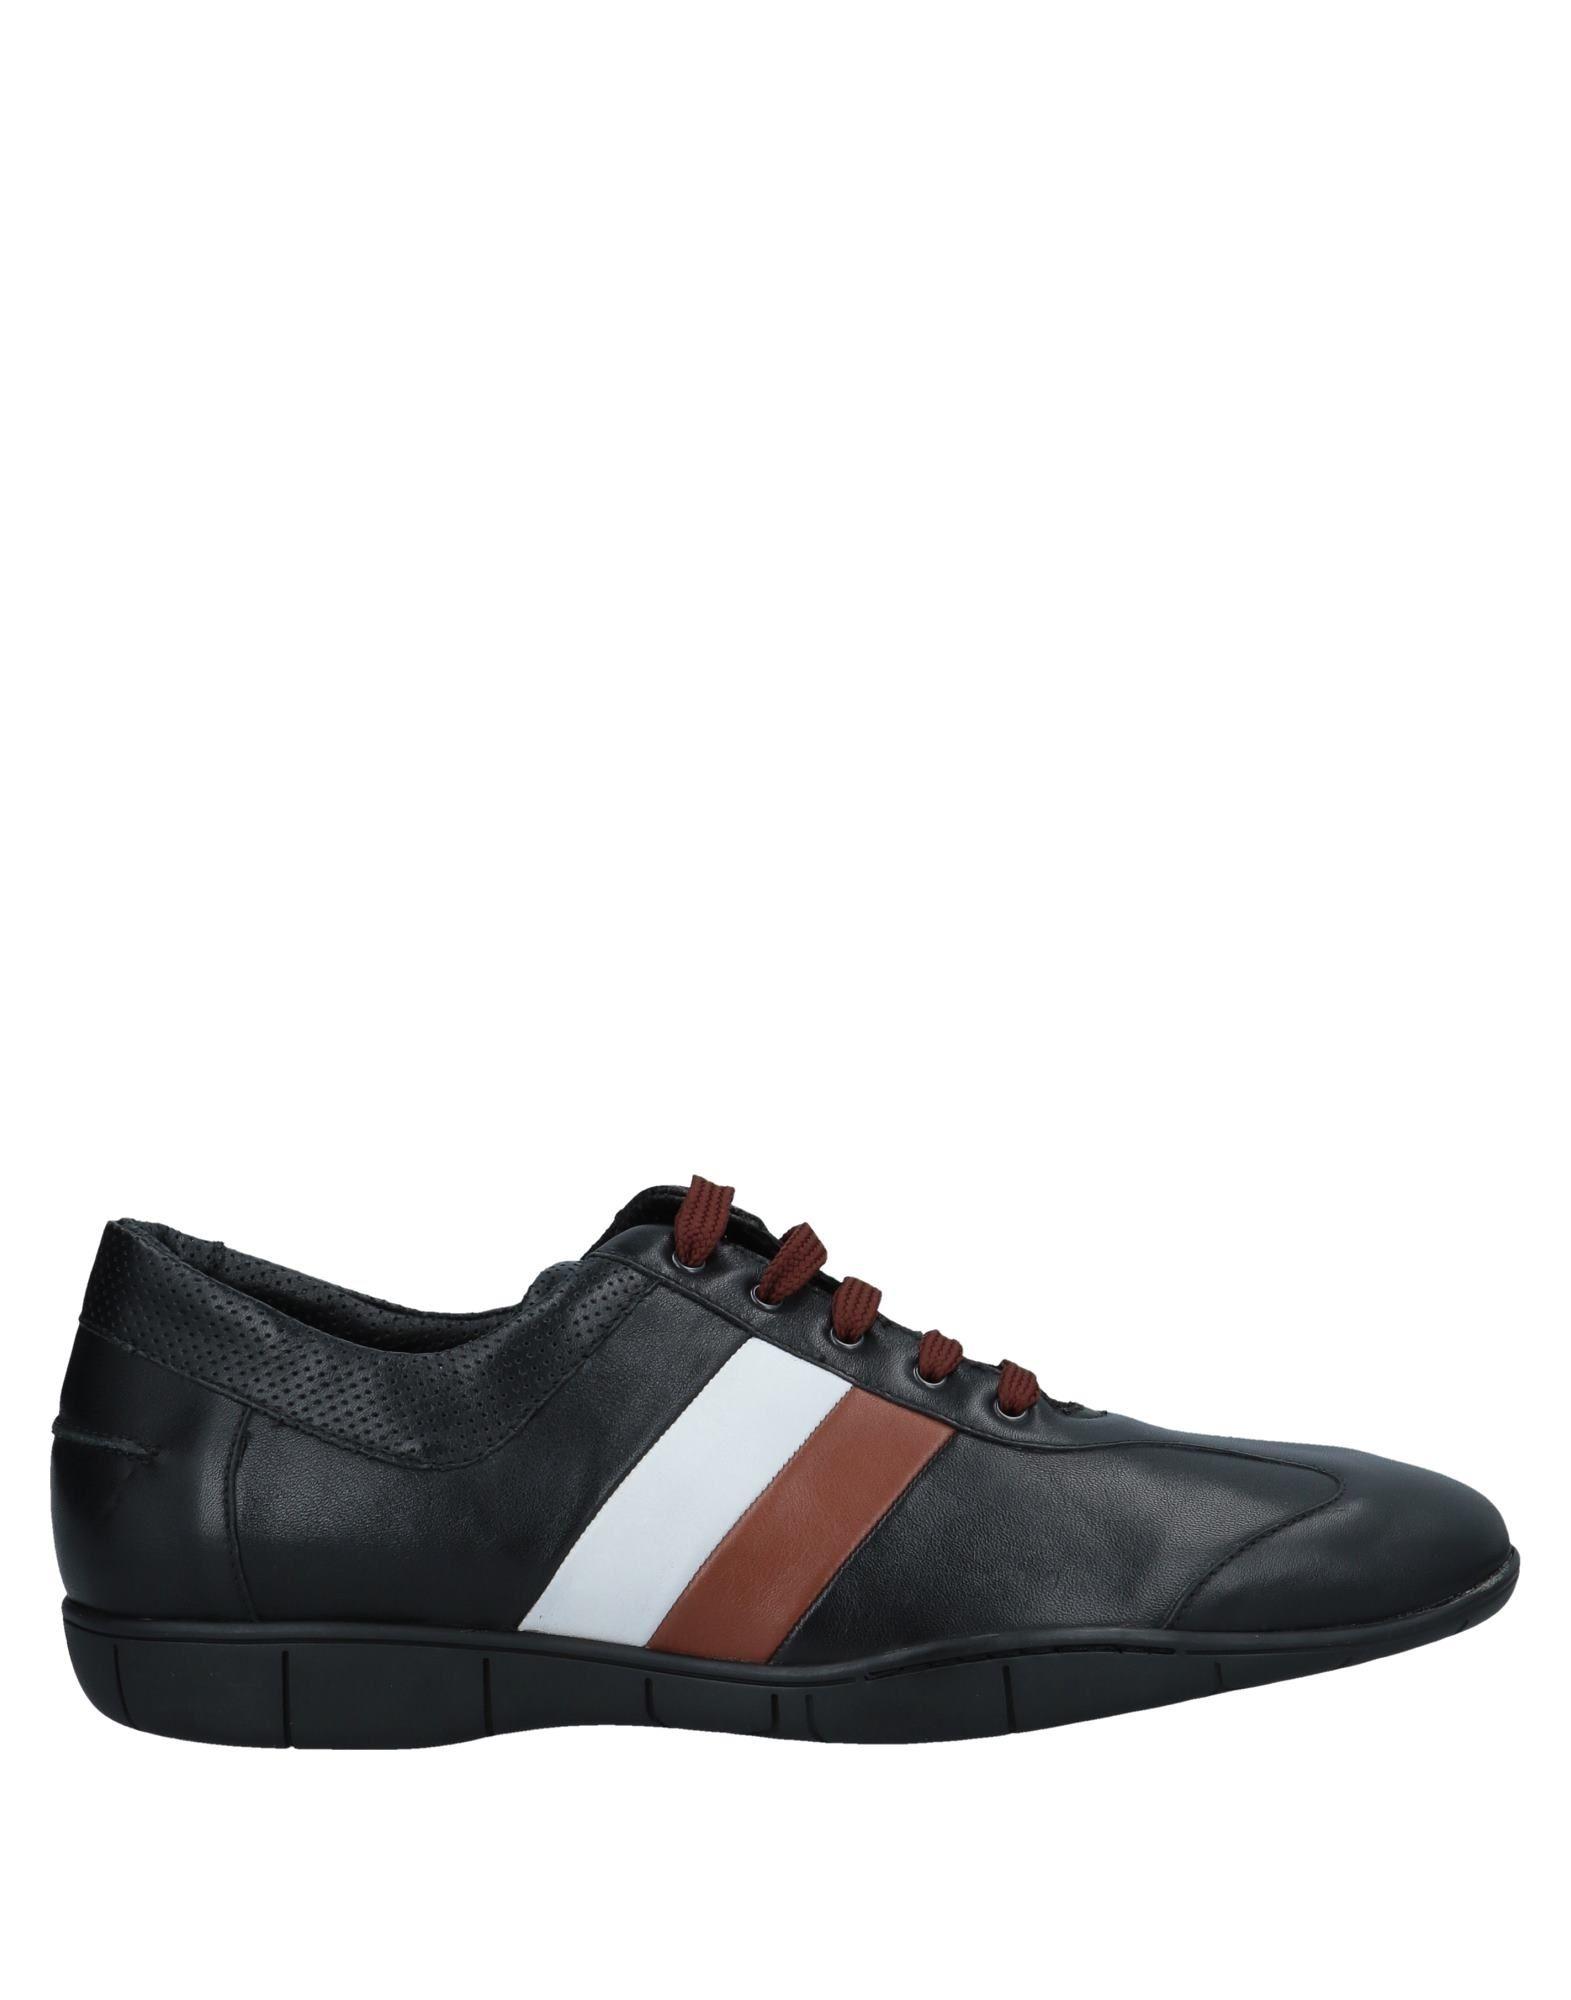 A.Testoni Sneakers Herren  11555462QS Gute Qualität beliebte Schuhe